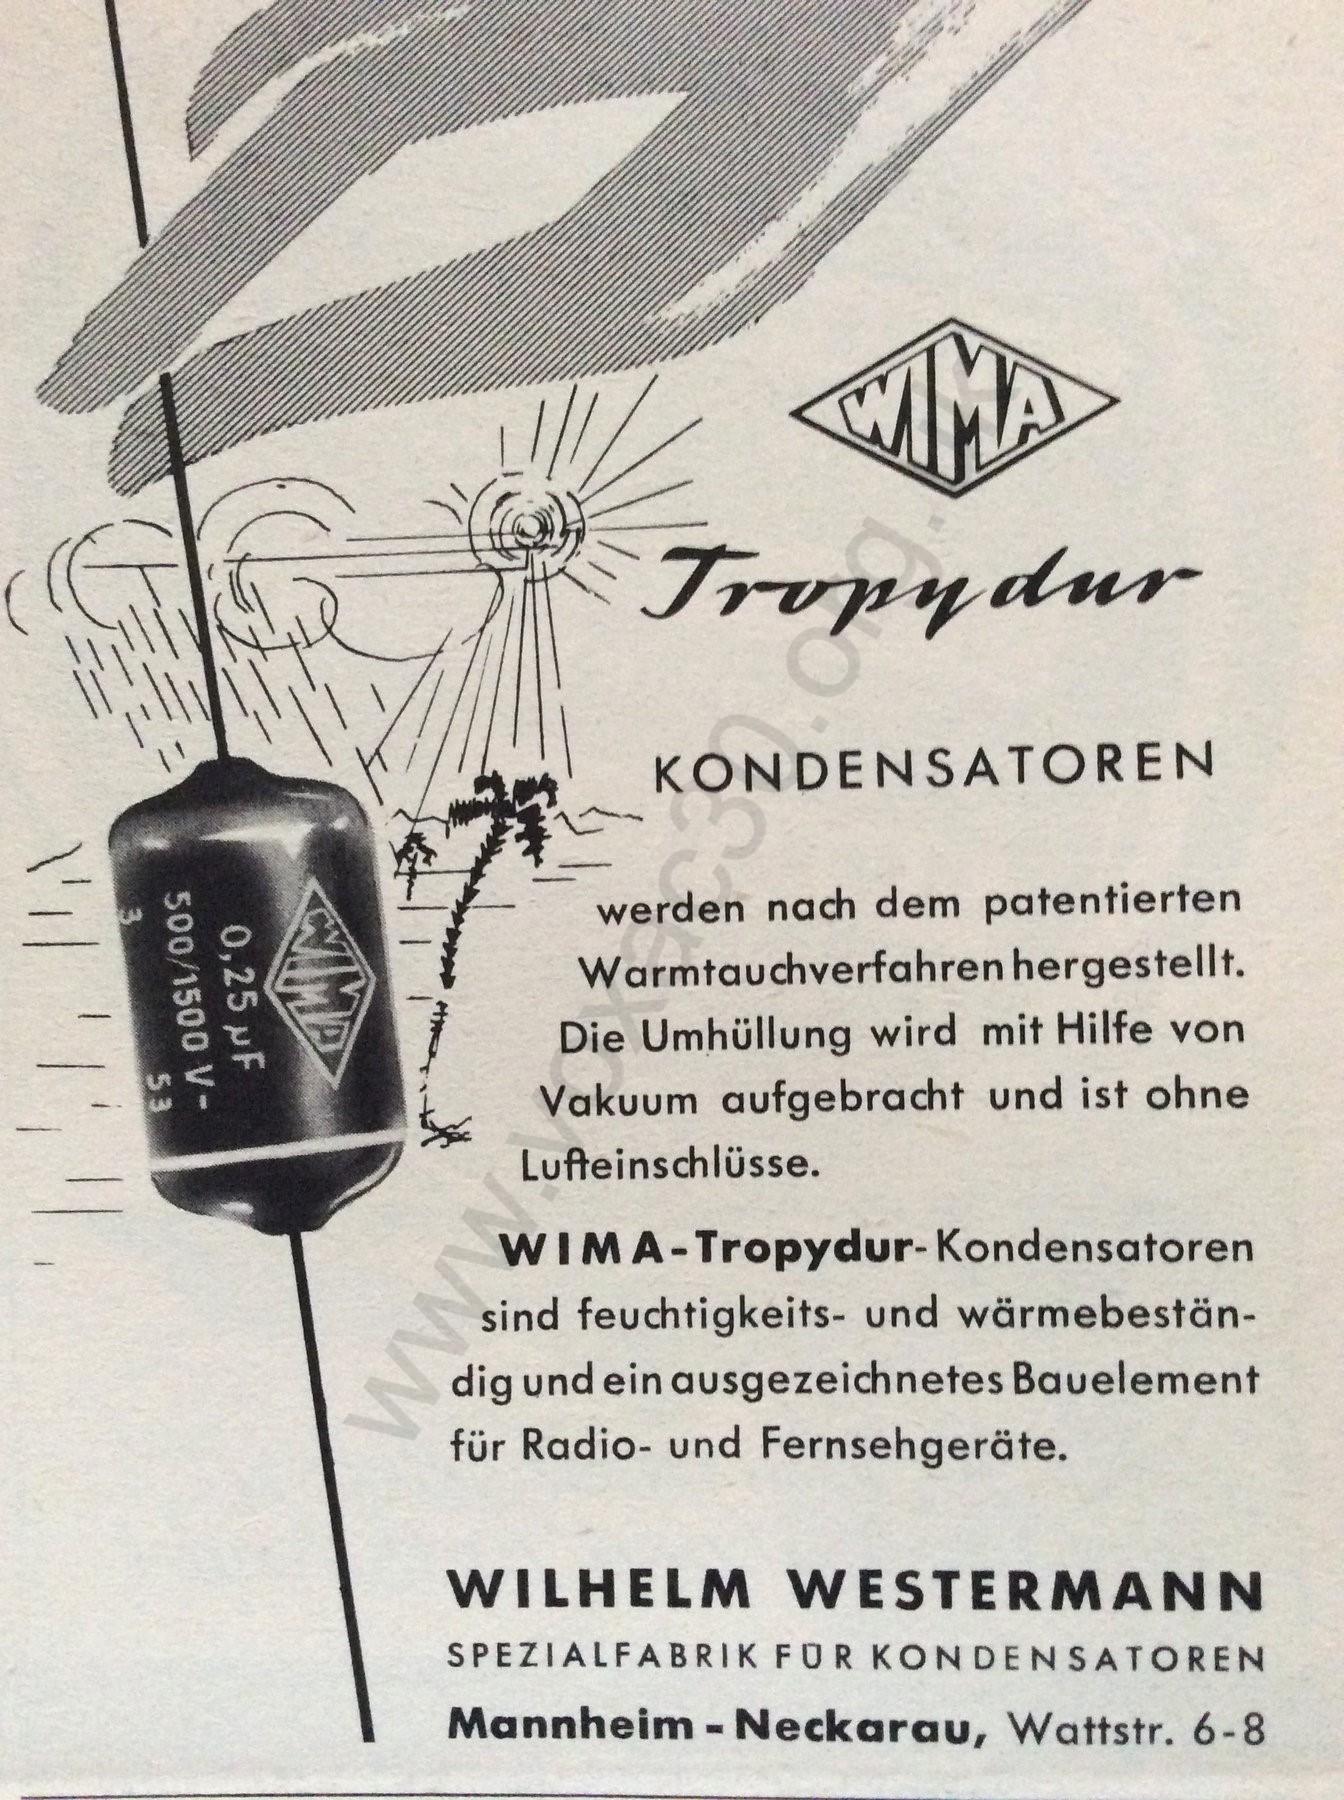 WIMA Tropydur capacitor ad